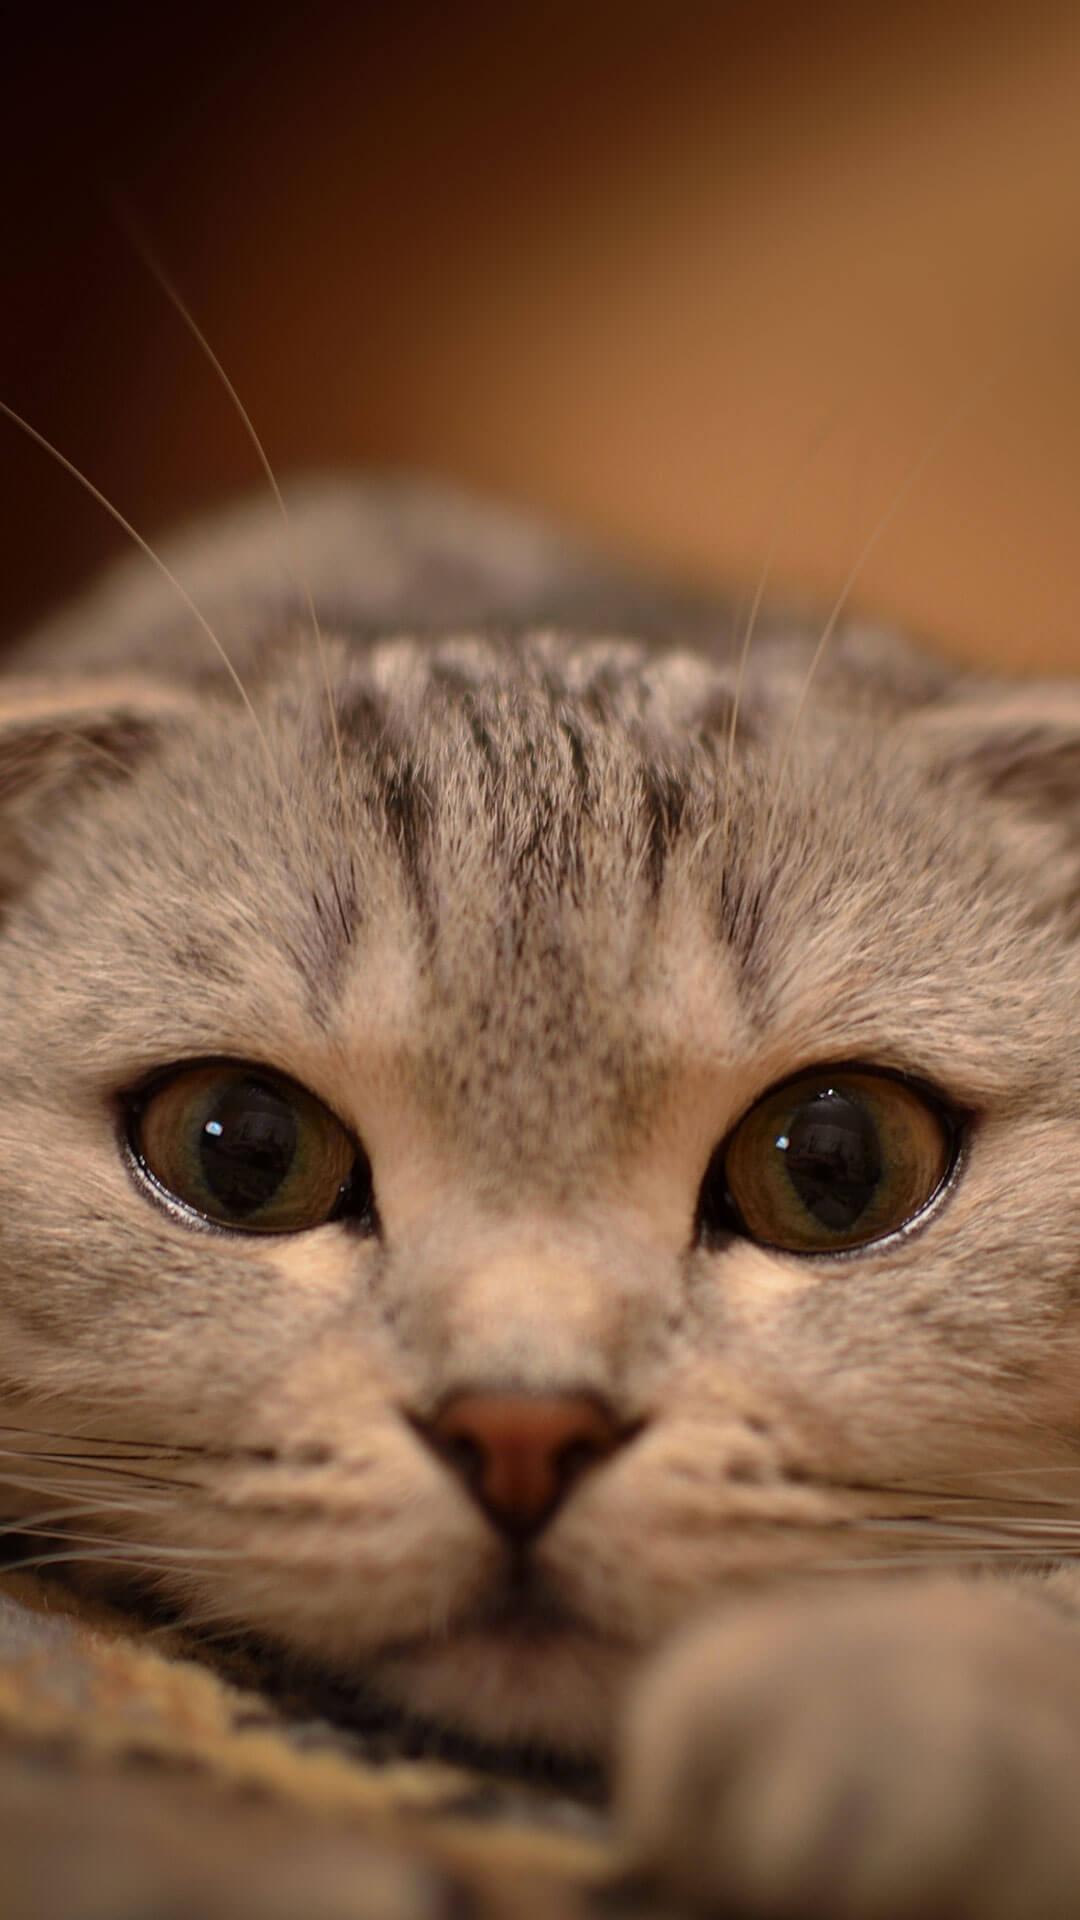 1080p Fall Wallpaper Cat Iphone Wallpapers Pixelstalk Net